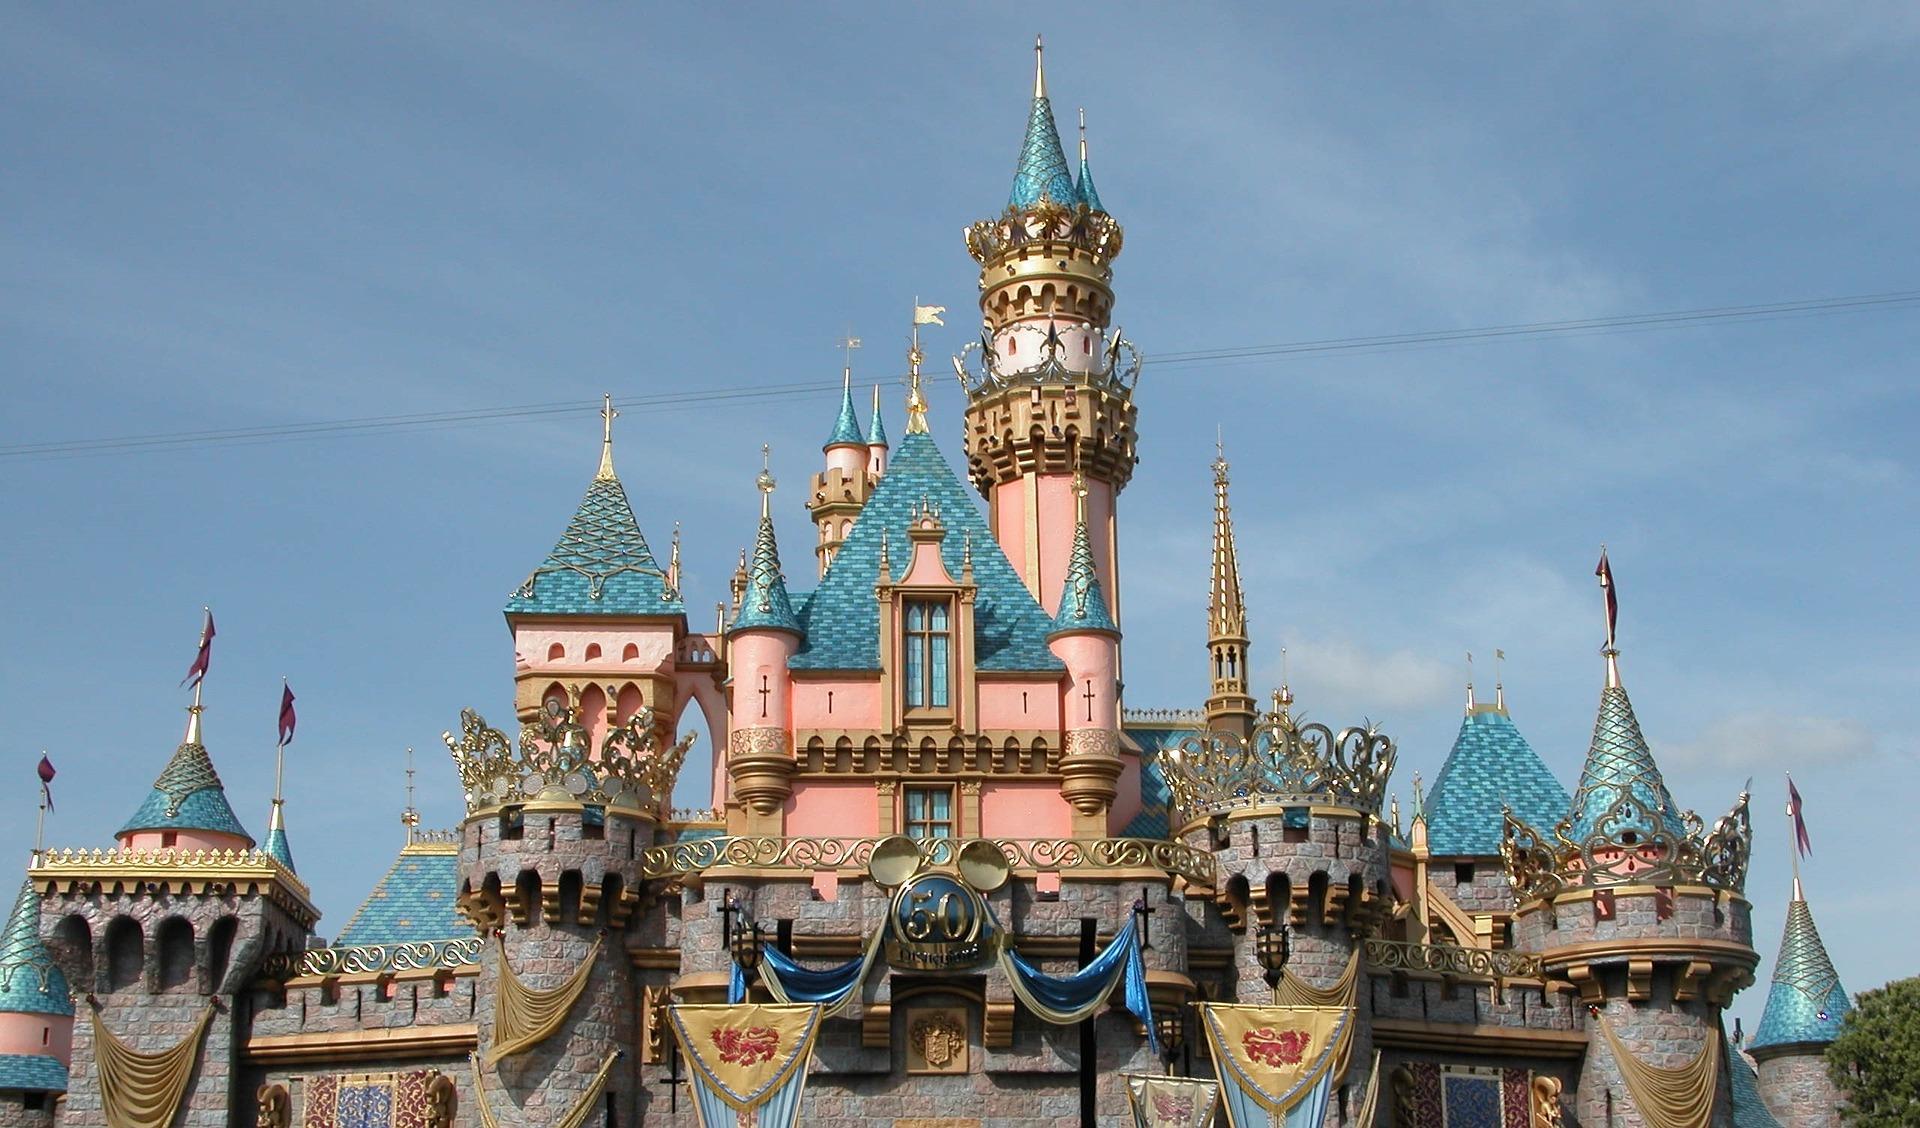 Sleeping Beauty Castle, Disneyland, Anaheim, California